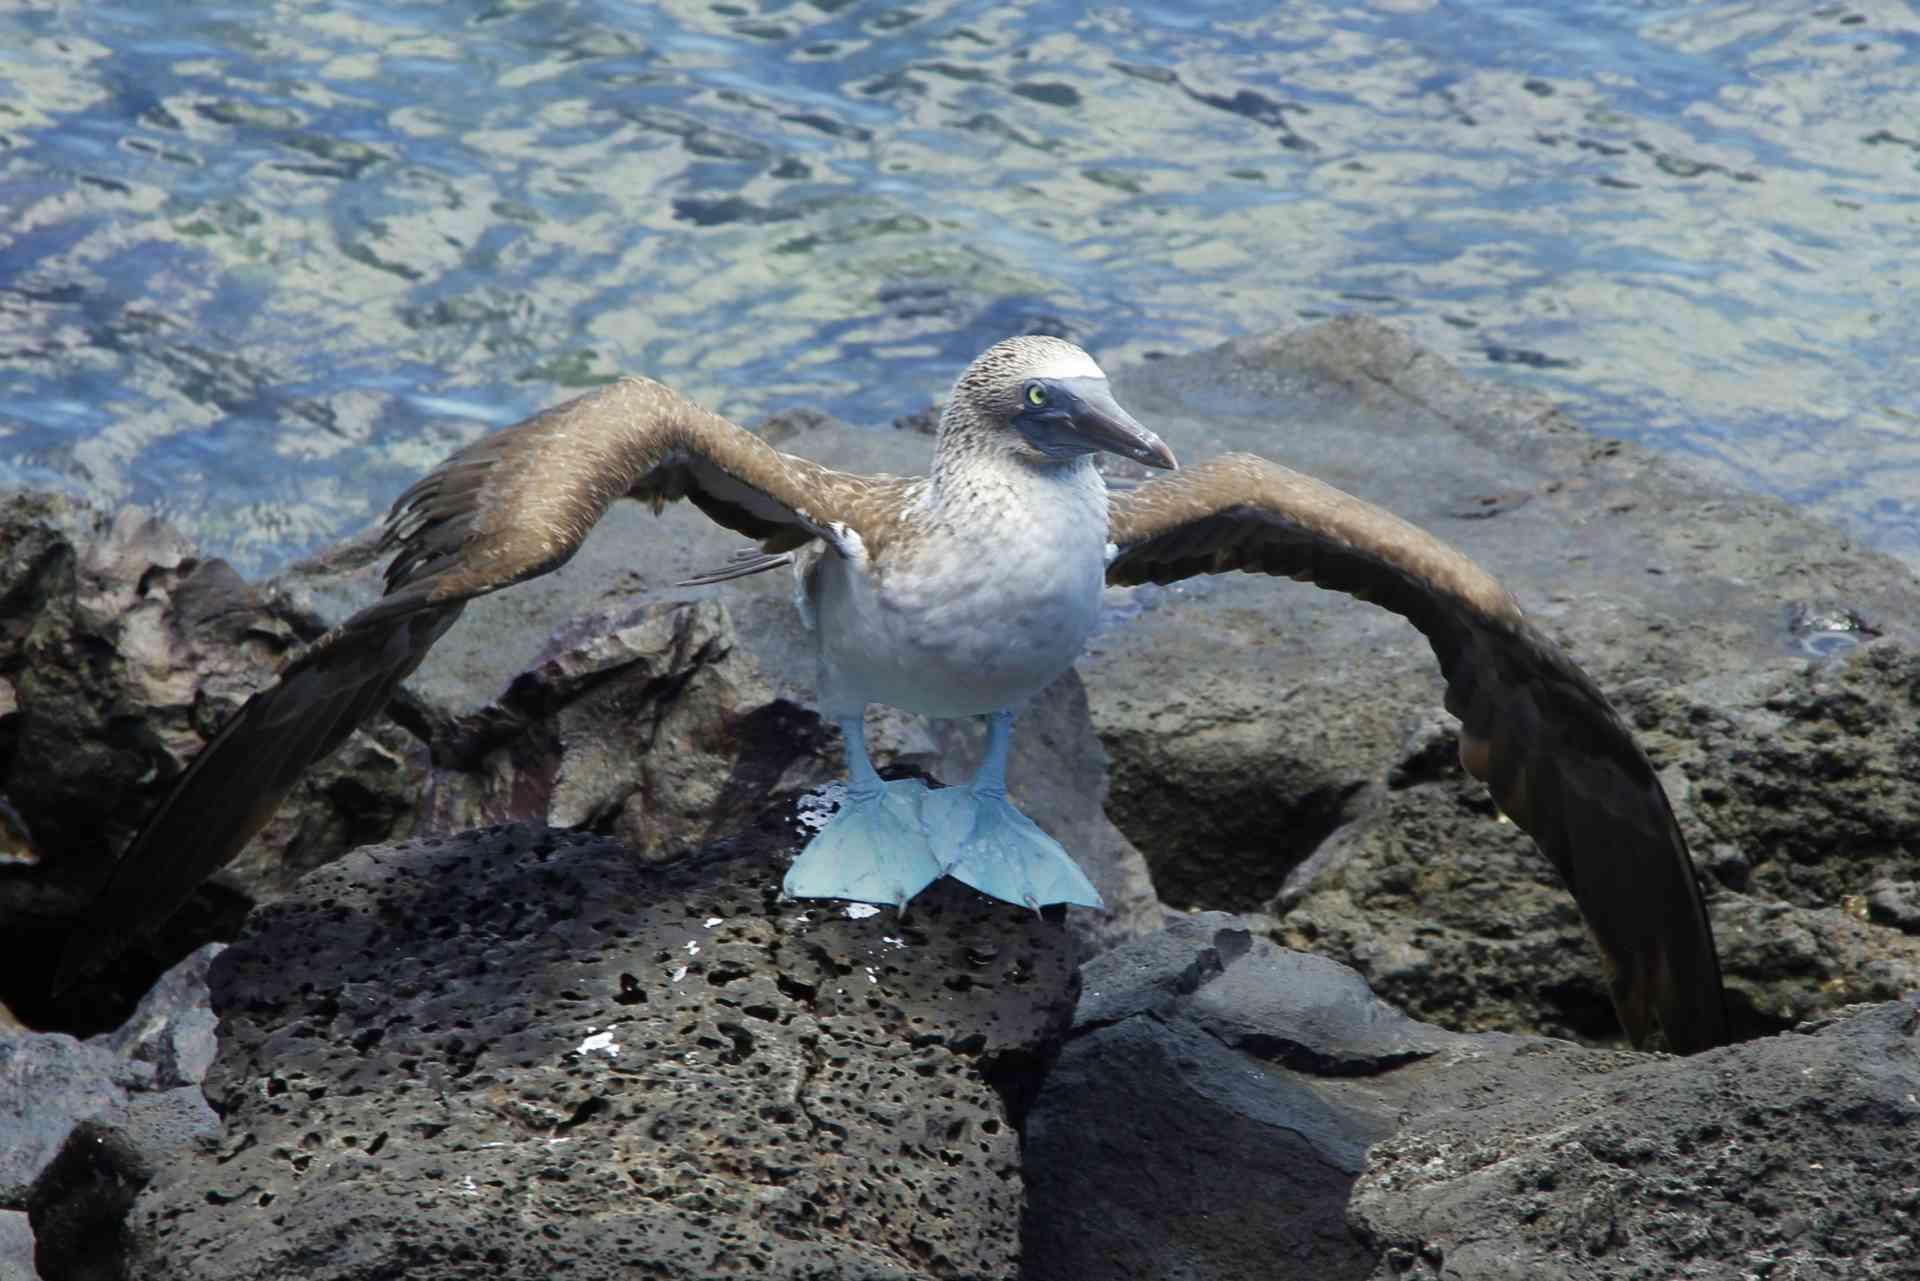 Blue-footed booby, Galapagos Islands, Ecuador by David Hammett